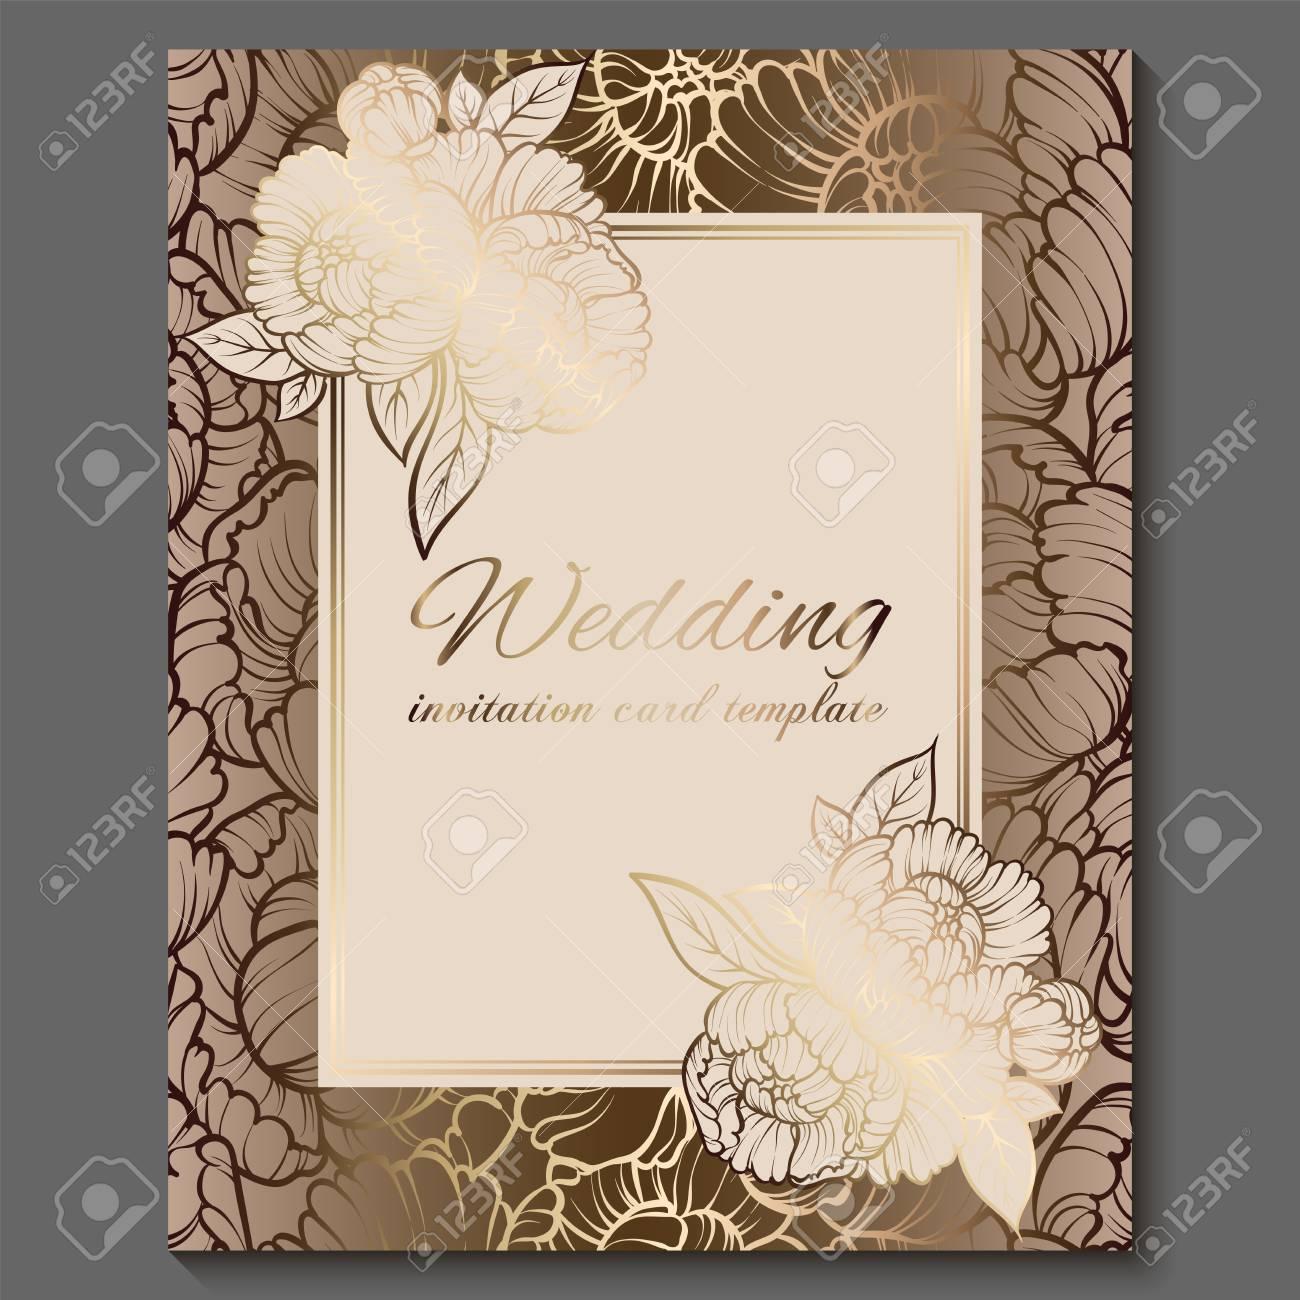 Luxury Wedding Invitations.Antique Royal Luxury Wedding Invitation Gold On White Background